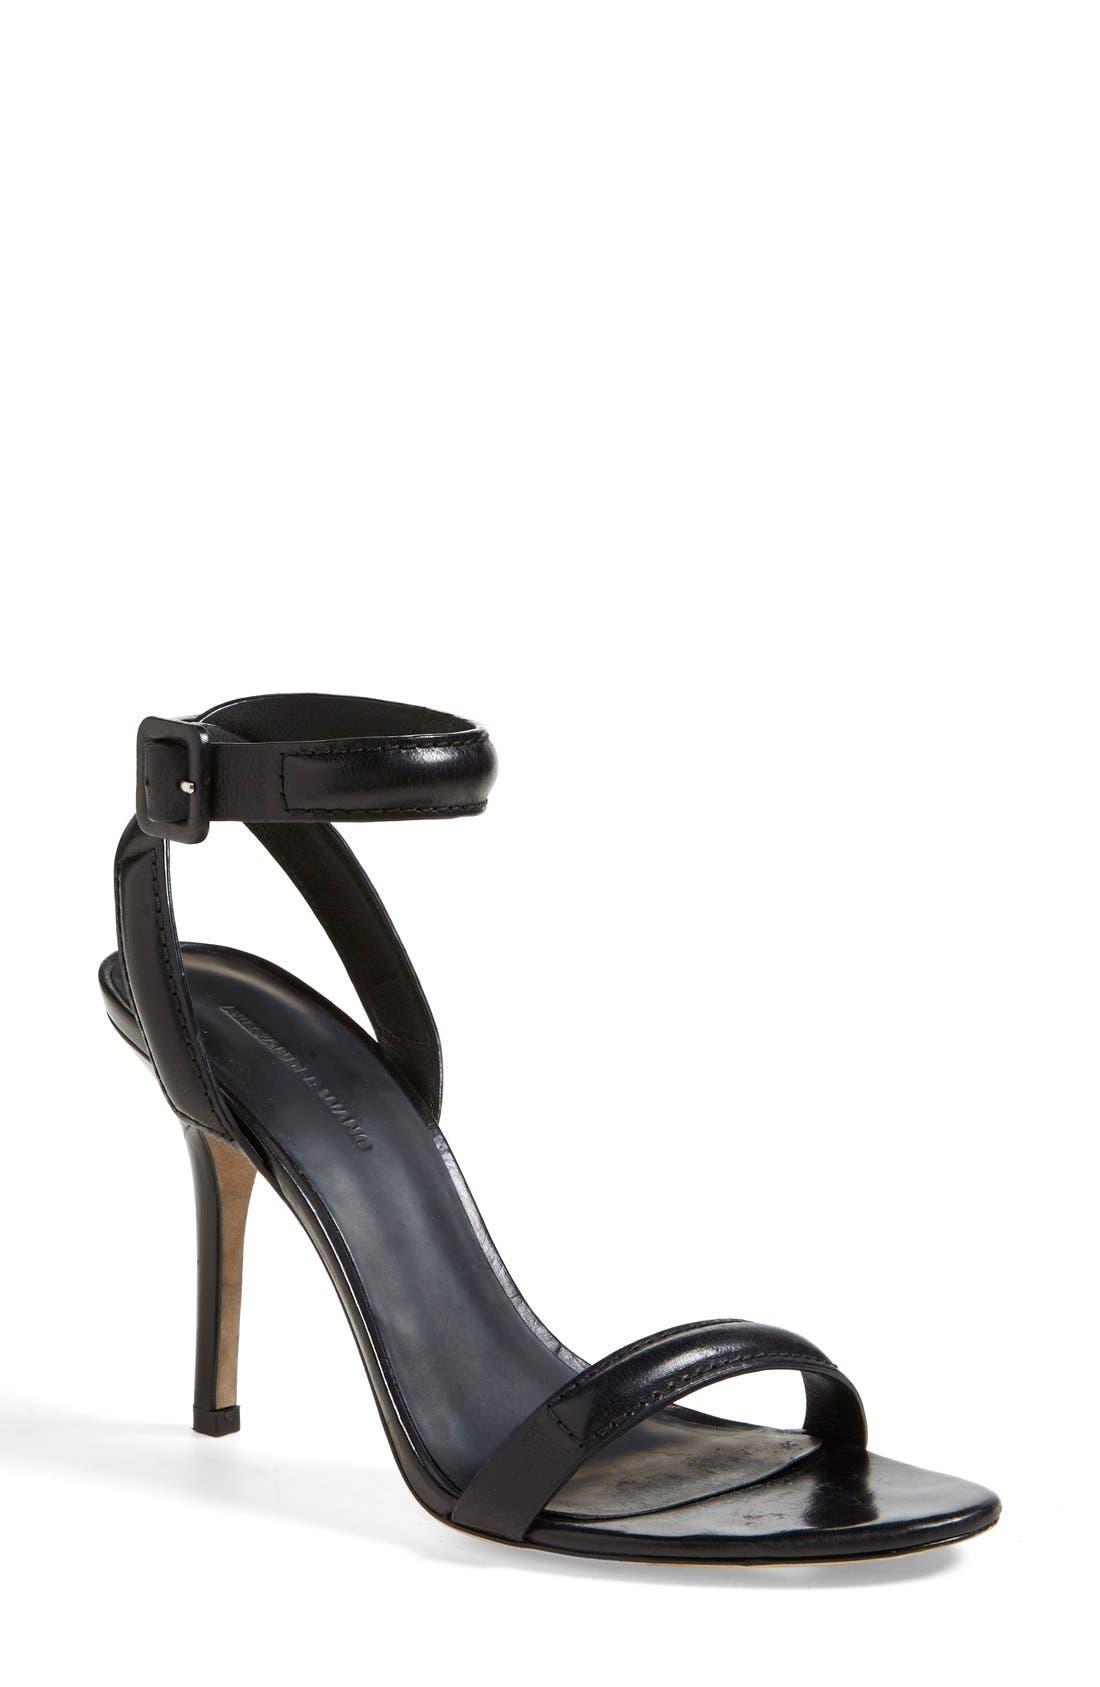 Alternate Image 1 Selected - Alexander Wang 'Antonia' Ankle Strap Sandal (Women)